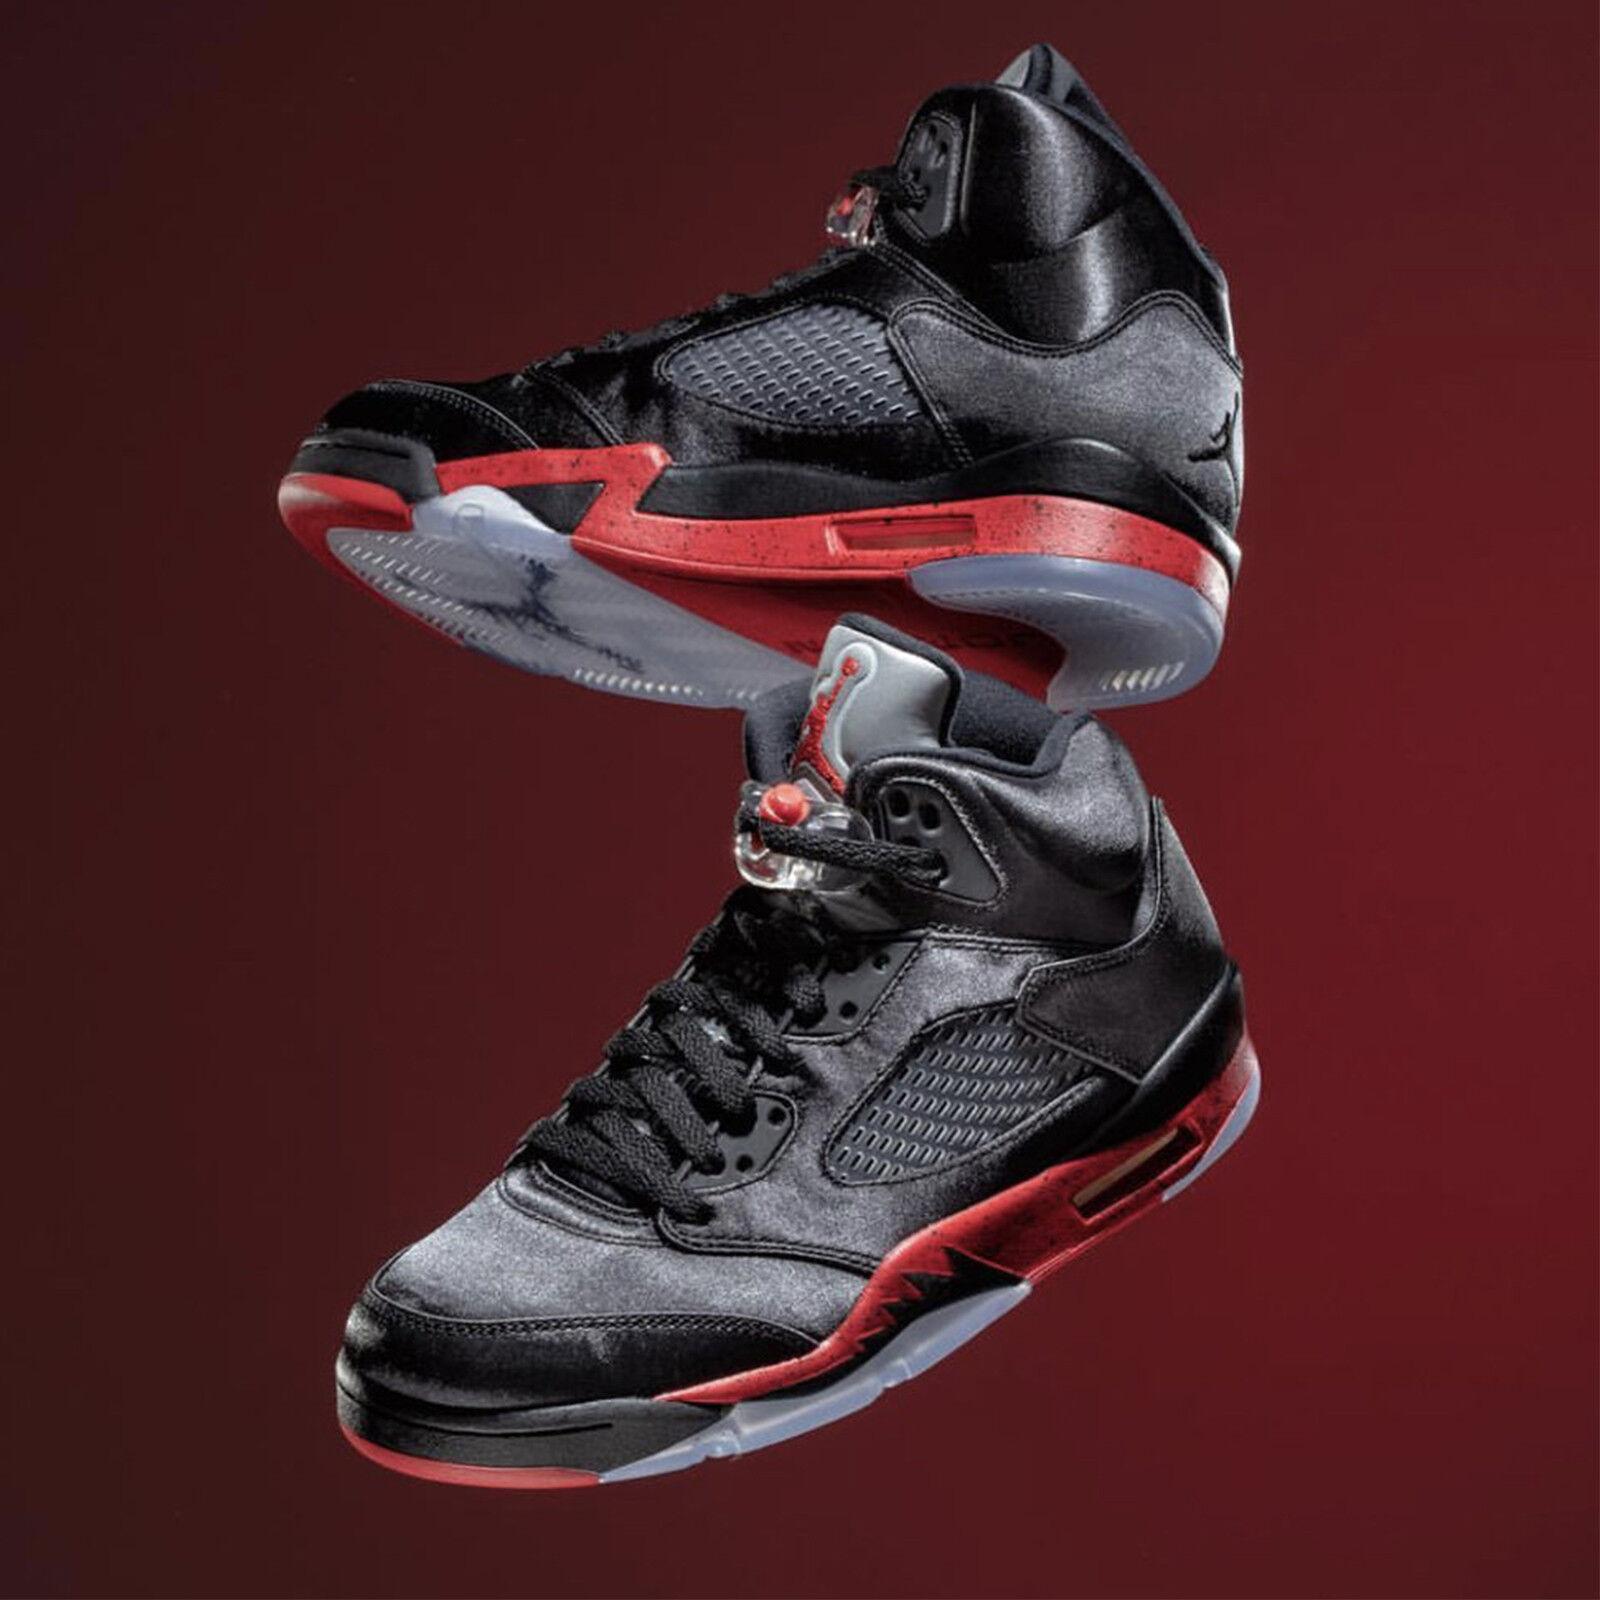 Nike Jordan 5 Retro V Satén Air Negro Rojo Rojo Rojo Universitario Brojo Hombres Mujeres Niños Pick 1 5f2e2f